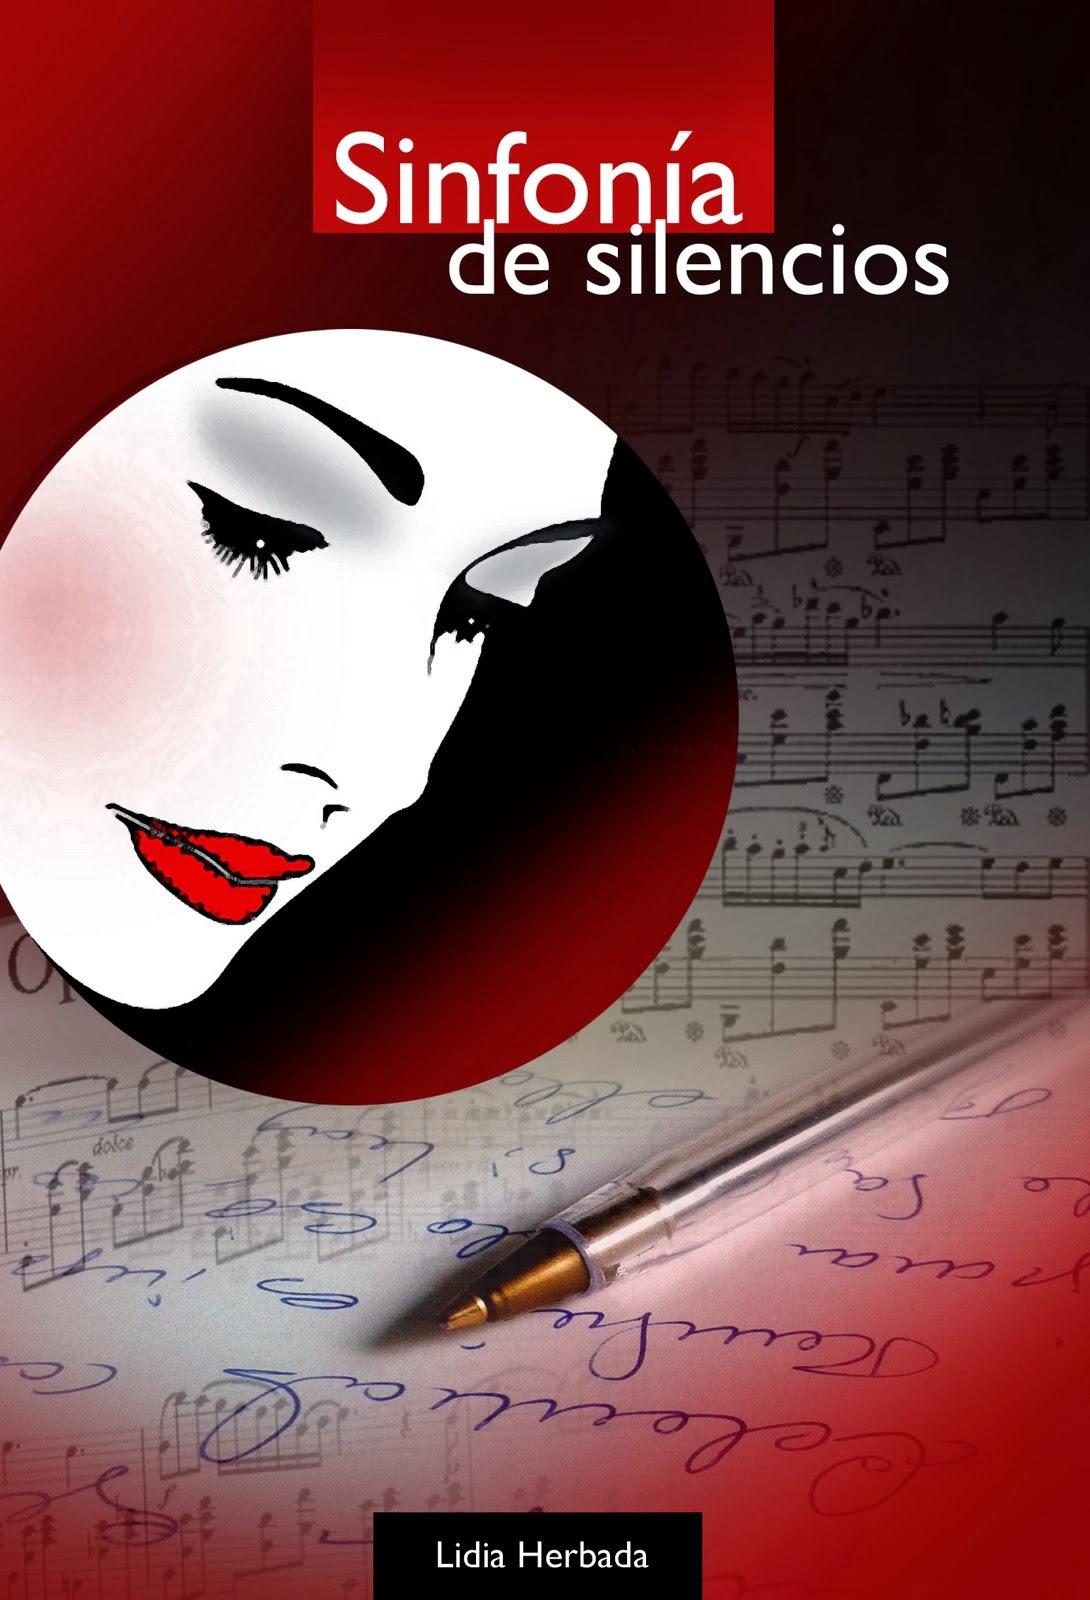 http://estantesllenos.blogspot.com.es/2014/02/sinfonia-de-silencios-lidia-herbada.html